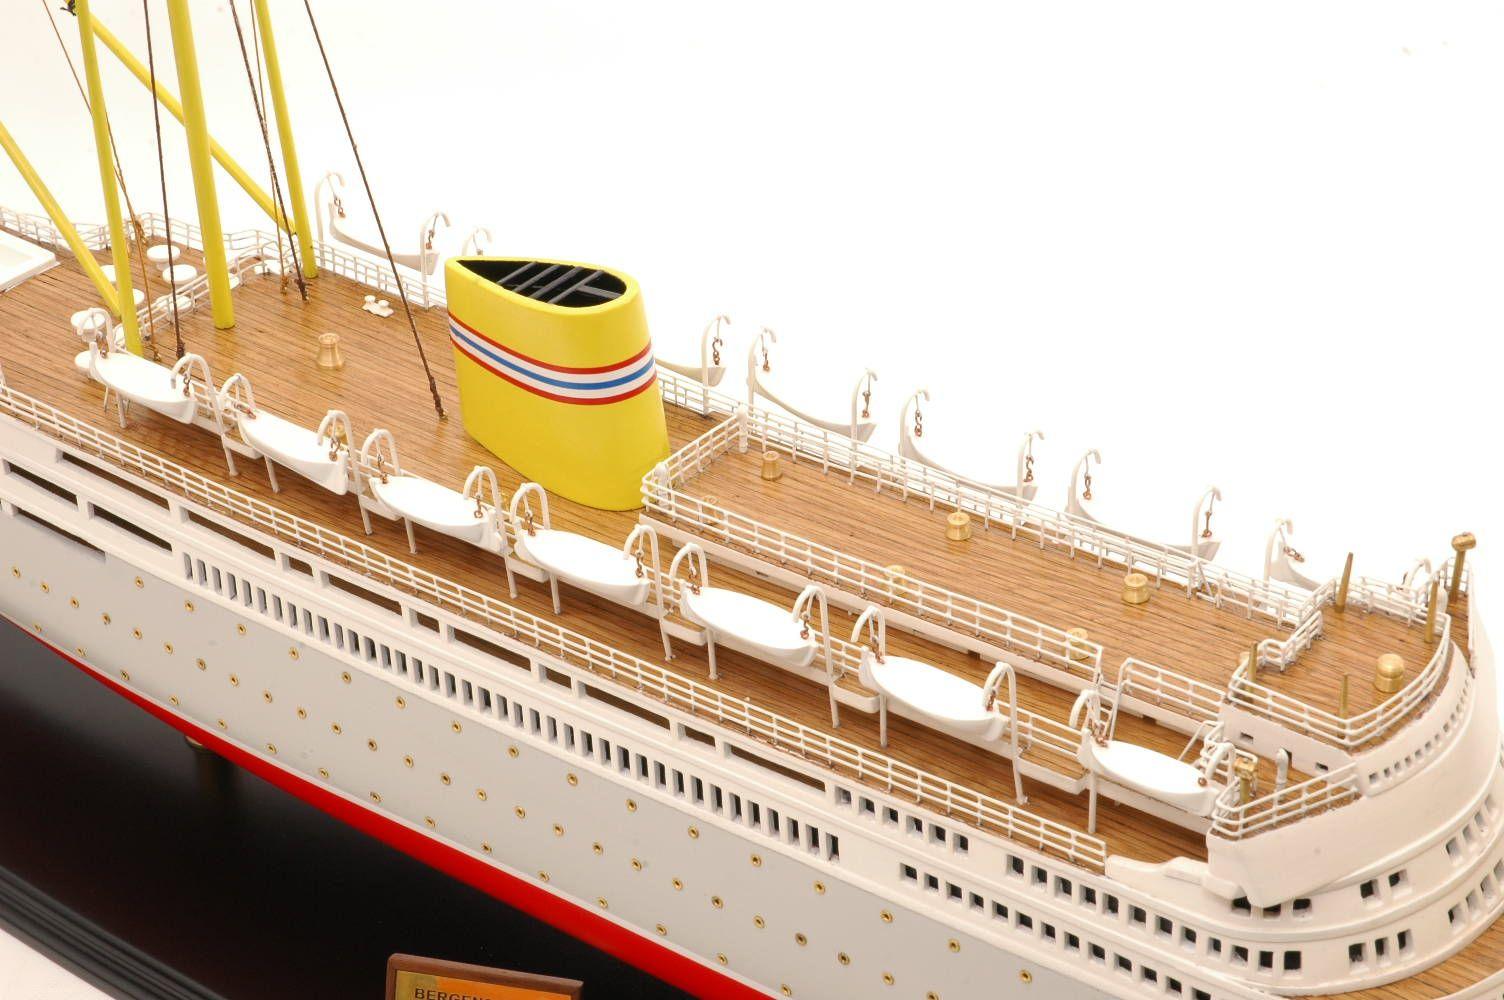 549-6434-Bergensfjord-model-ship